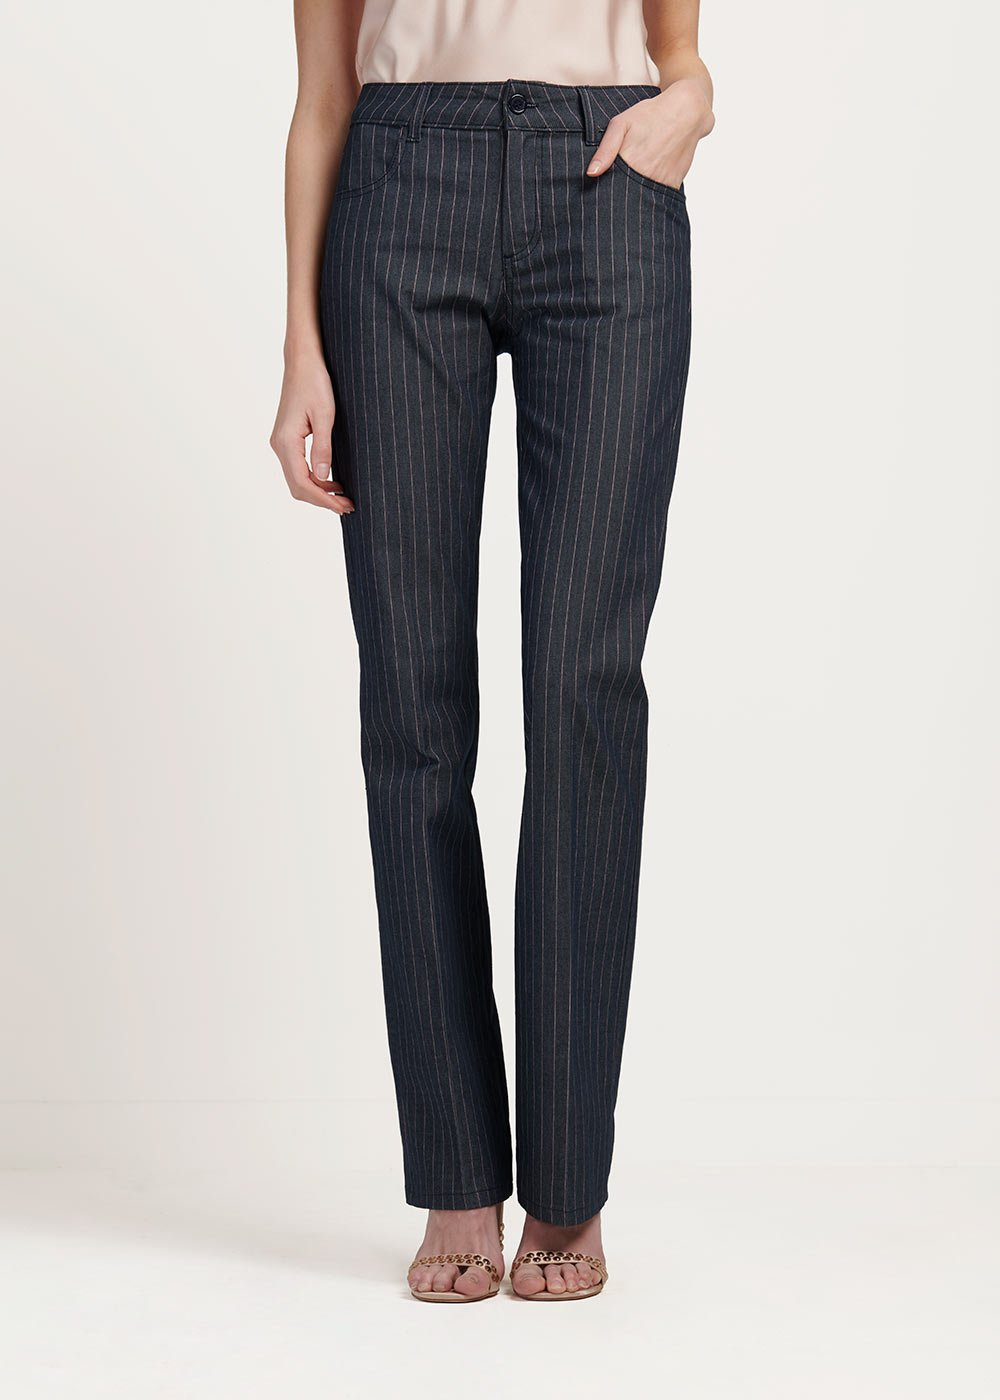 Cindy trousers with pinstripe pattern - Denim\rosa Stripes - Woman